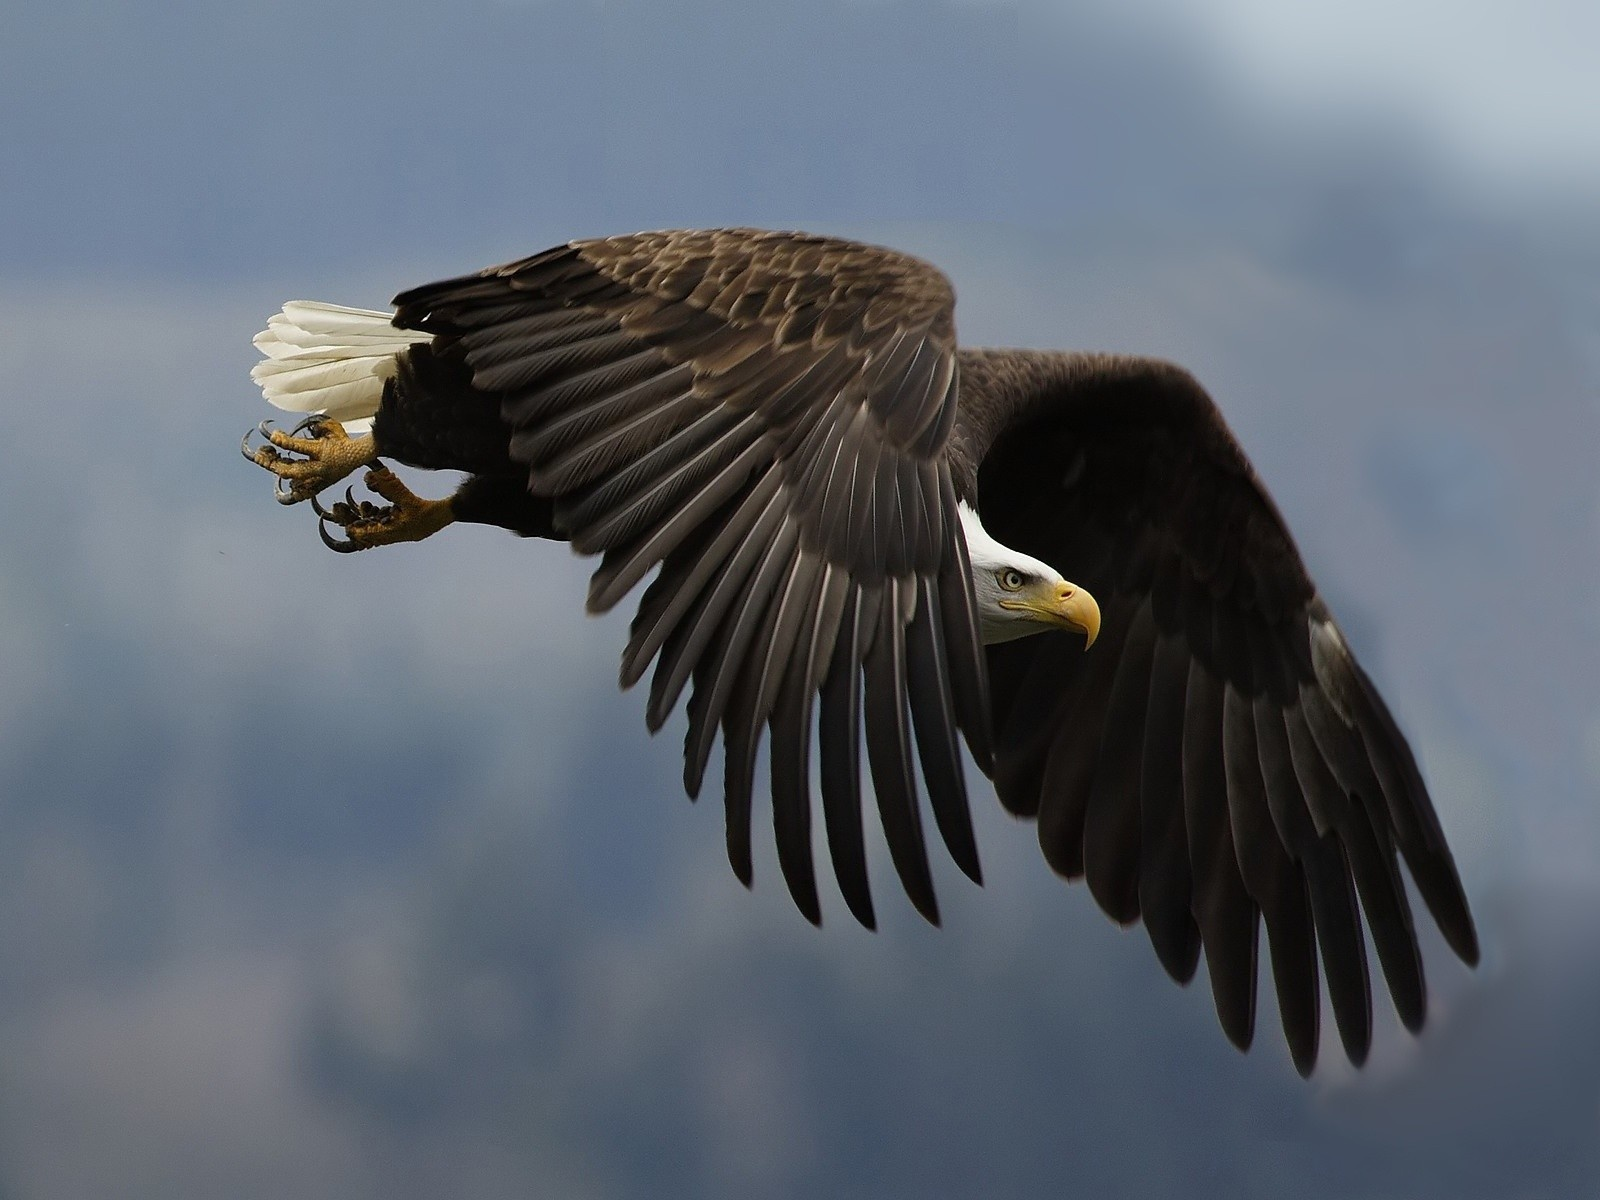 Must see   Wallpaper Horse Eagle - Eagle+Hawk+wallpapers  Photograph_18522.jpg